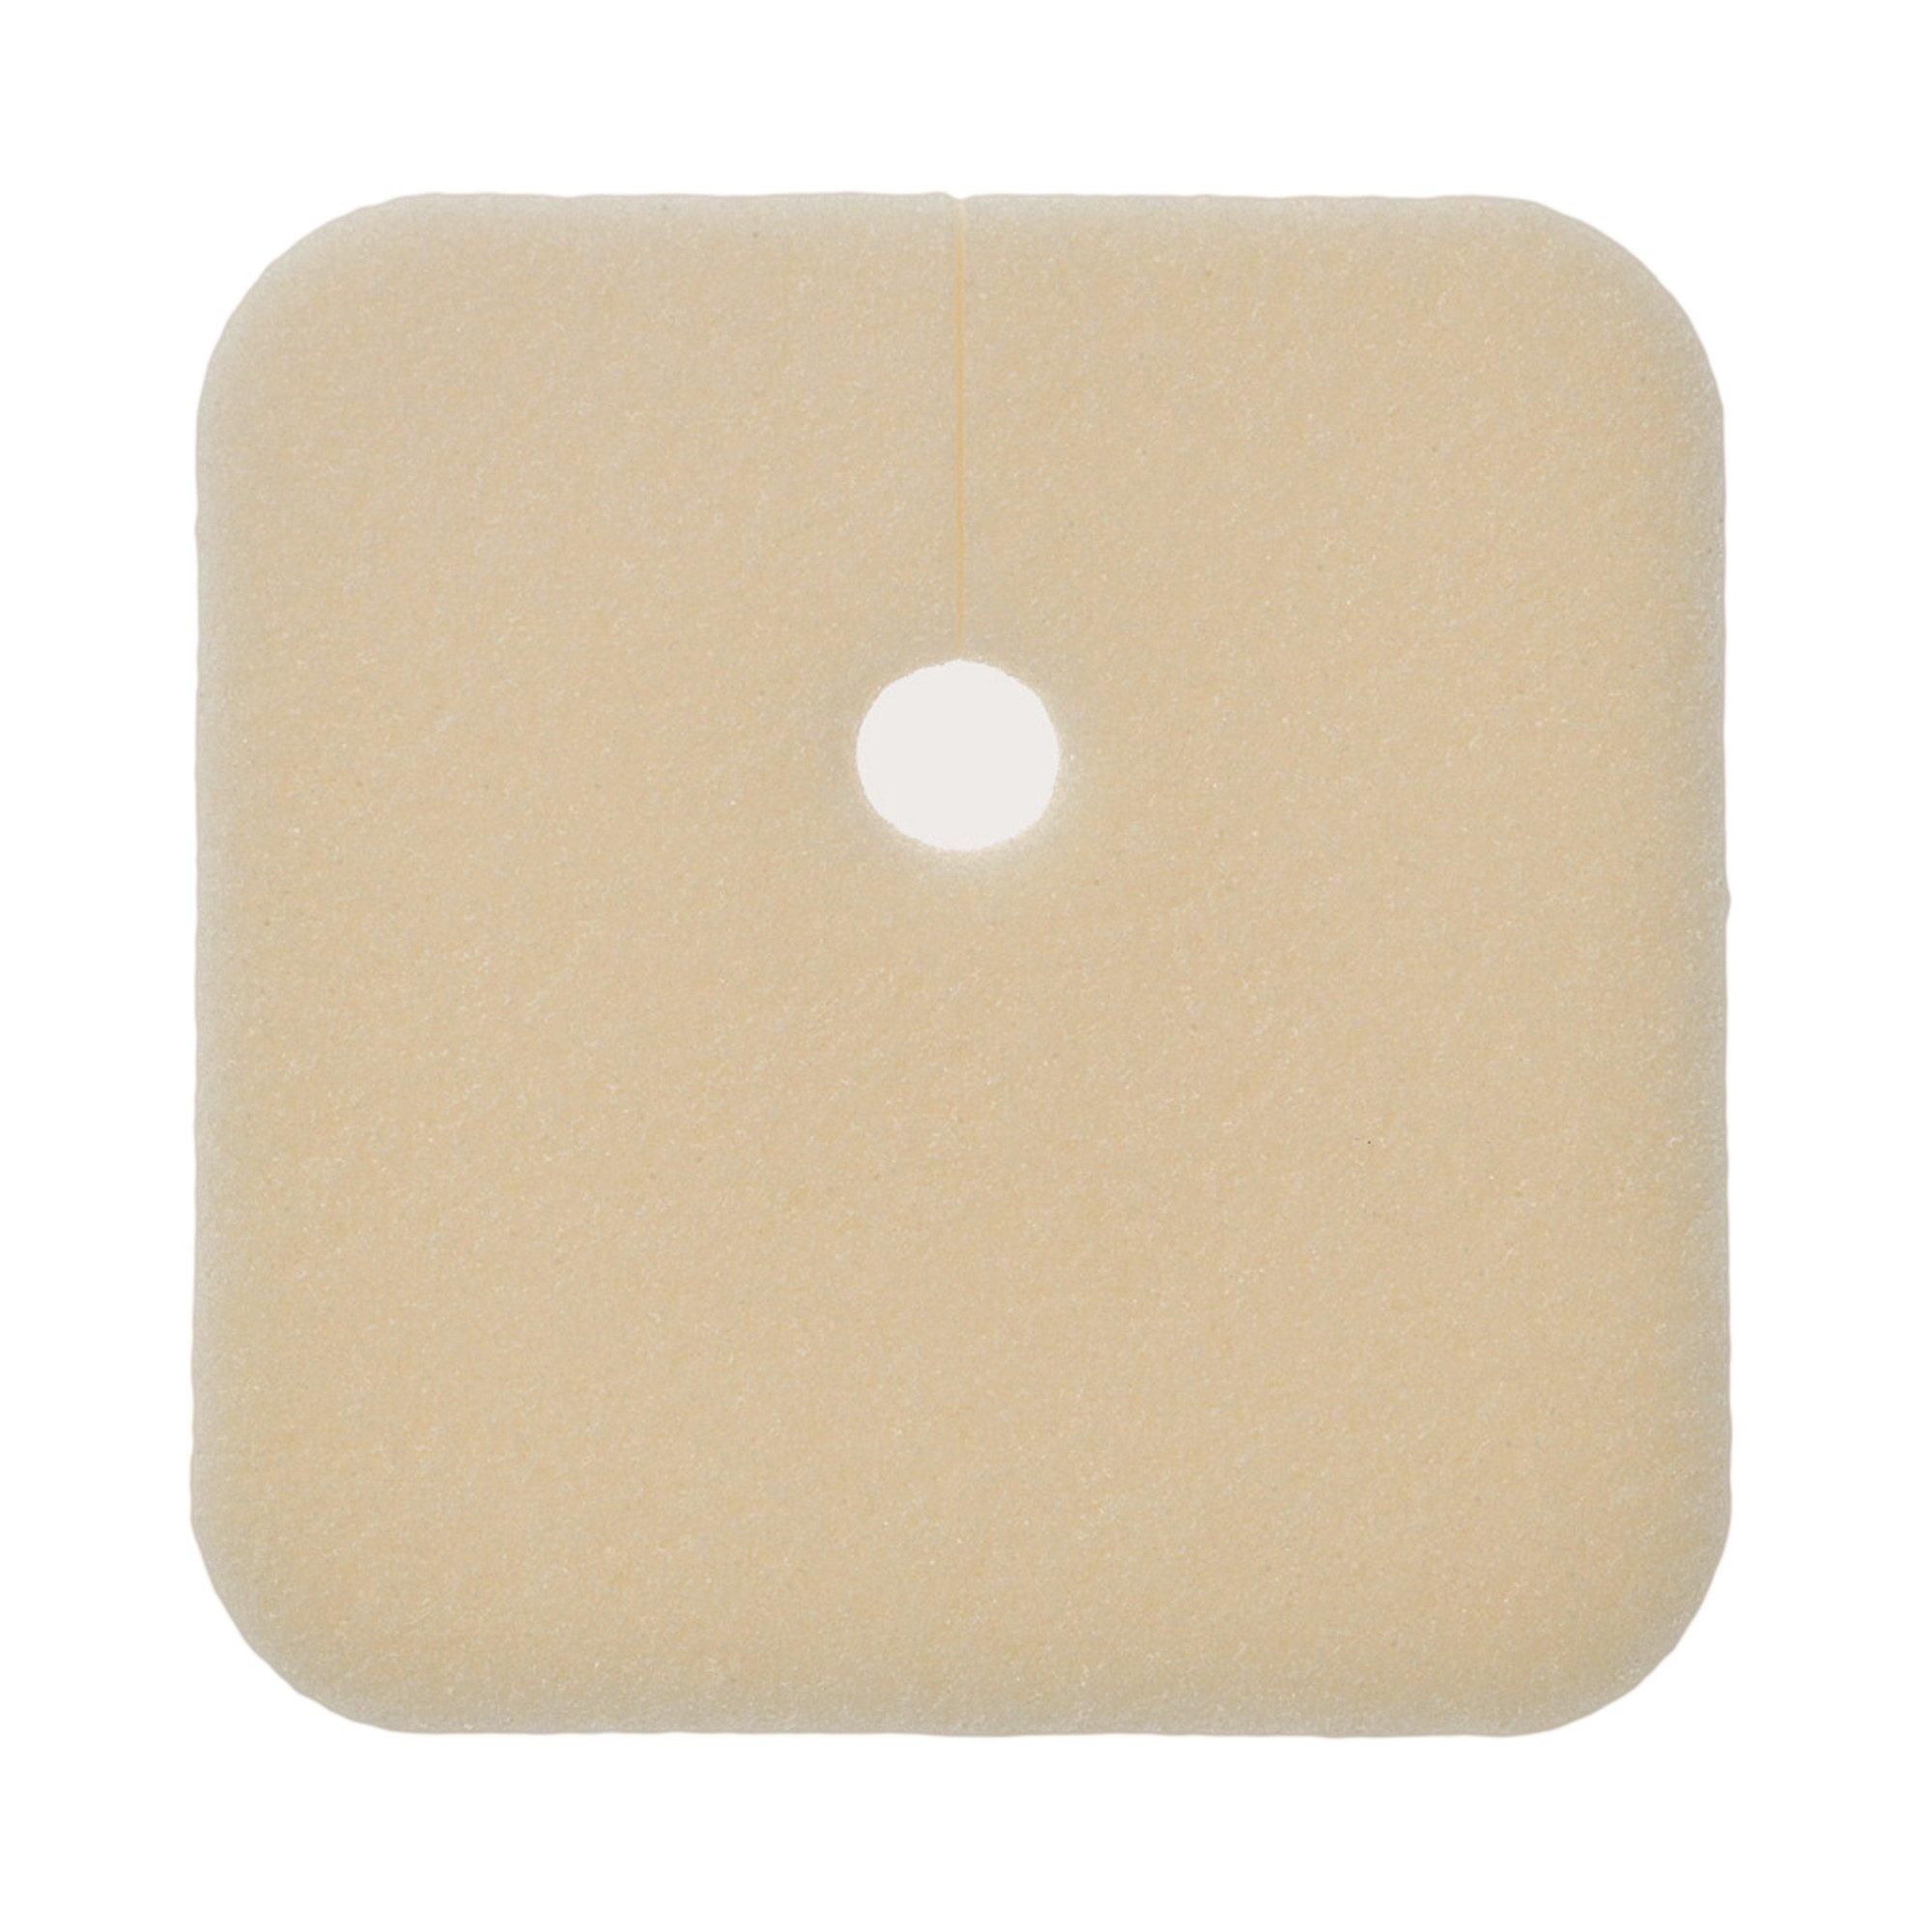 "Molnlycke Lyofoam Max T Non-adhesive without Border Foam Dressing, 3.5 X 3.5"", 603207, Box of 10"